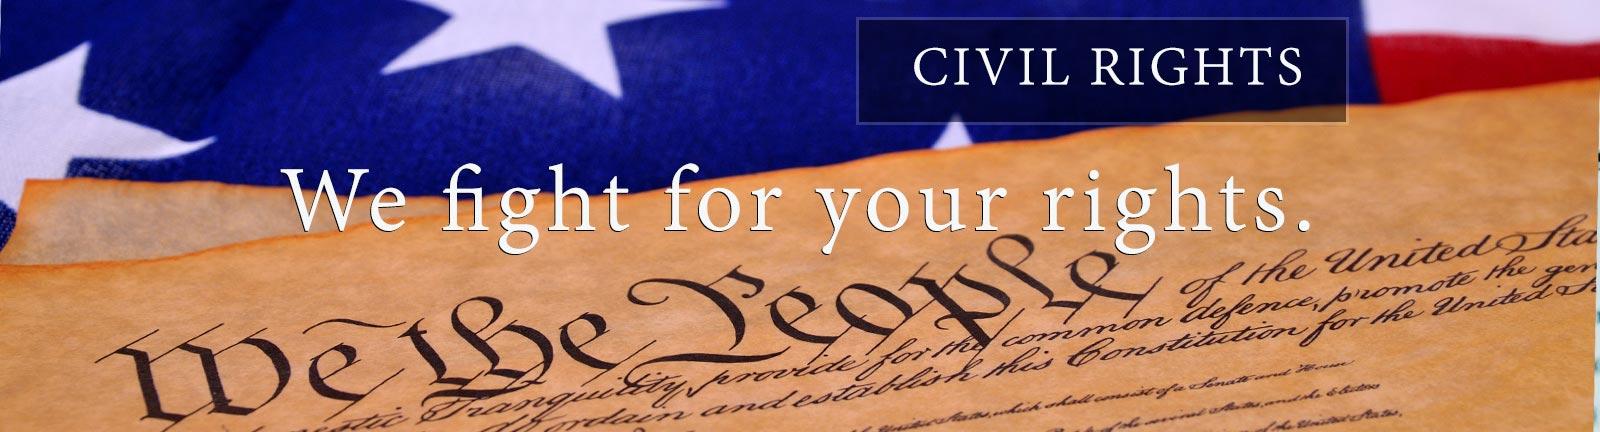 civil rights corpus christi